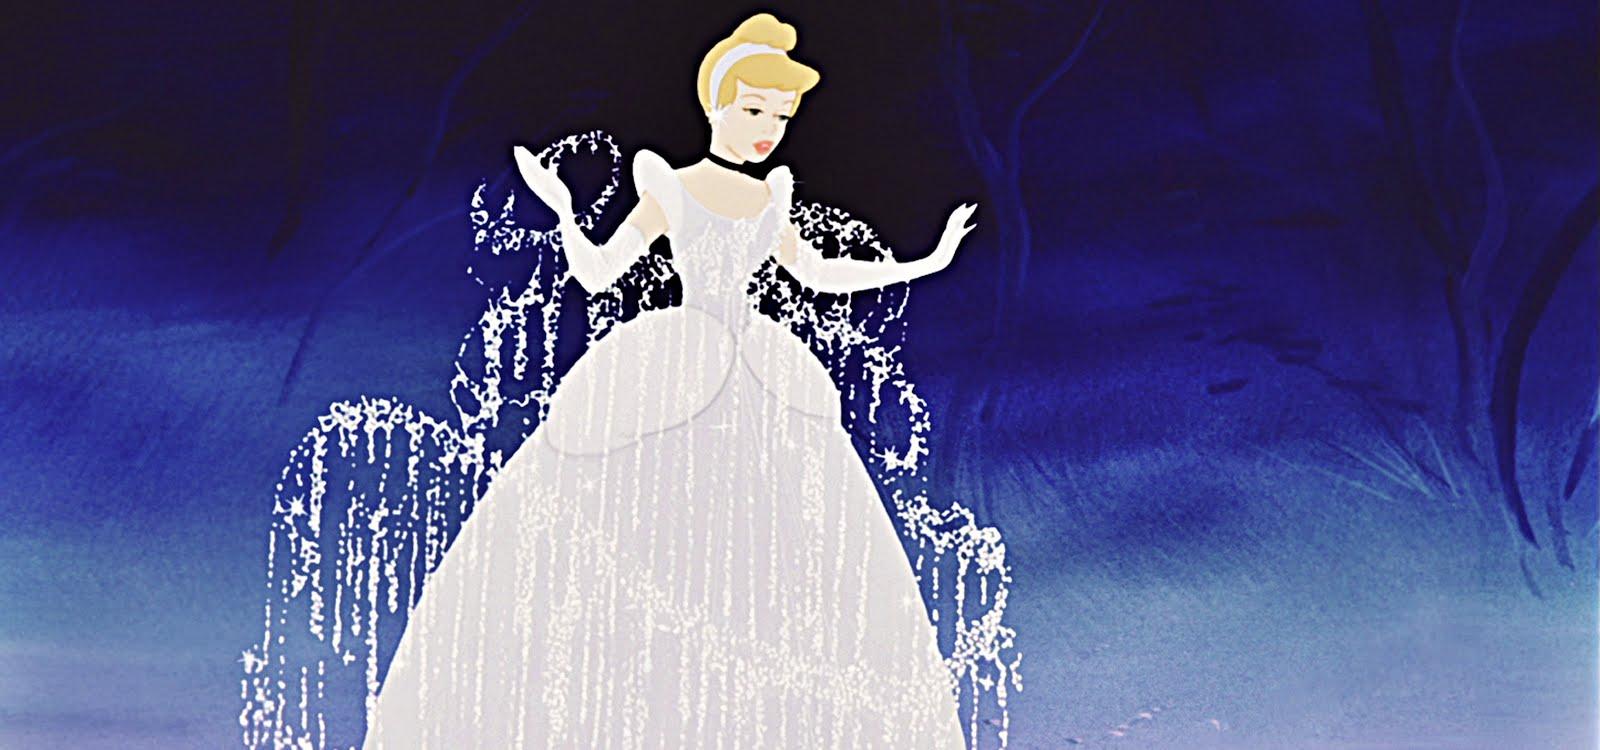 Disney-Princess-Screencaps-Princess-Cinderella-disney-princess ...